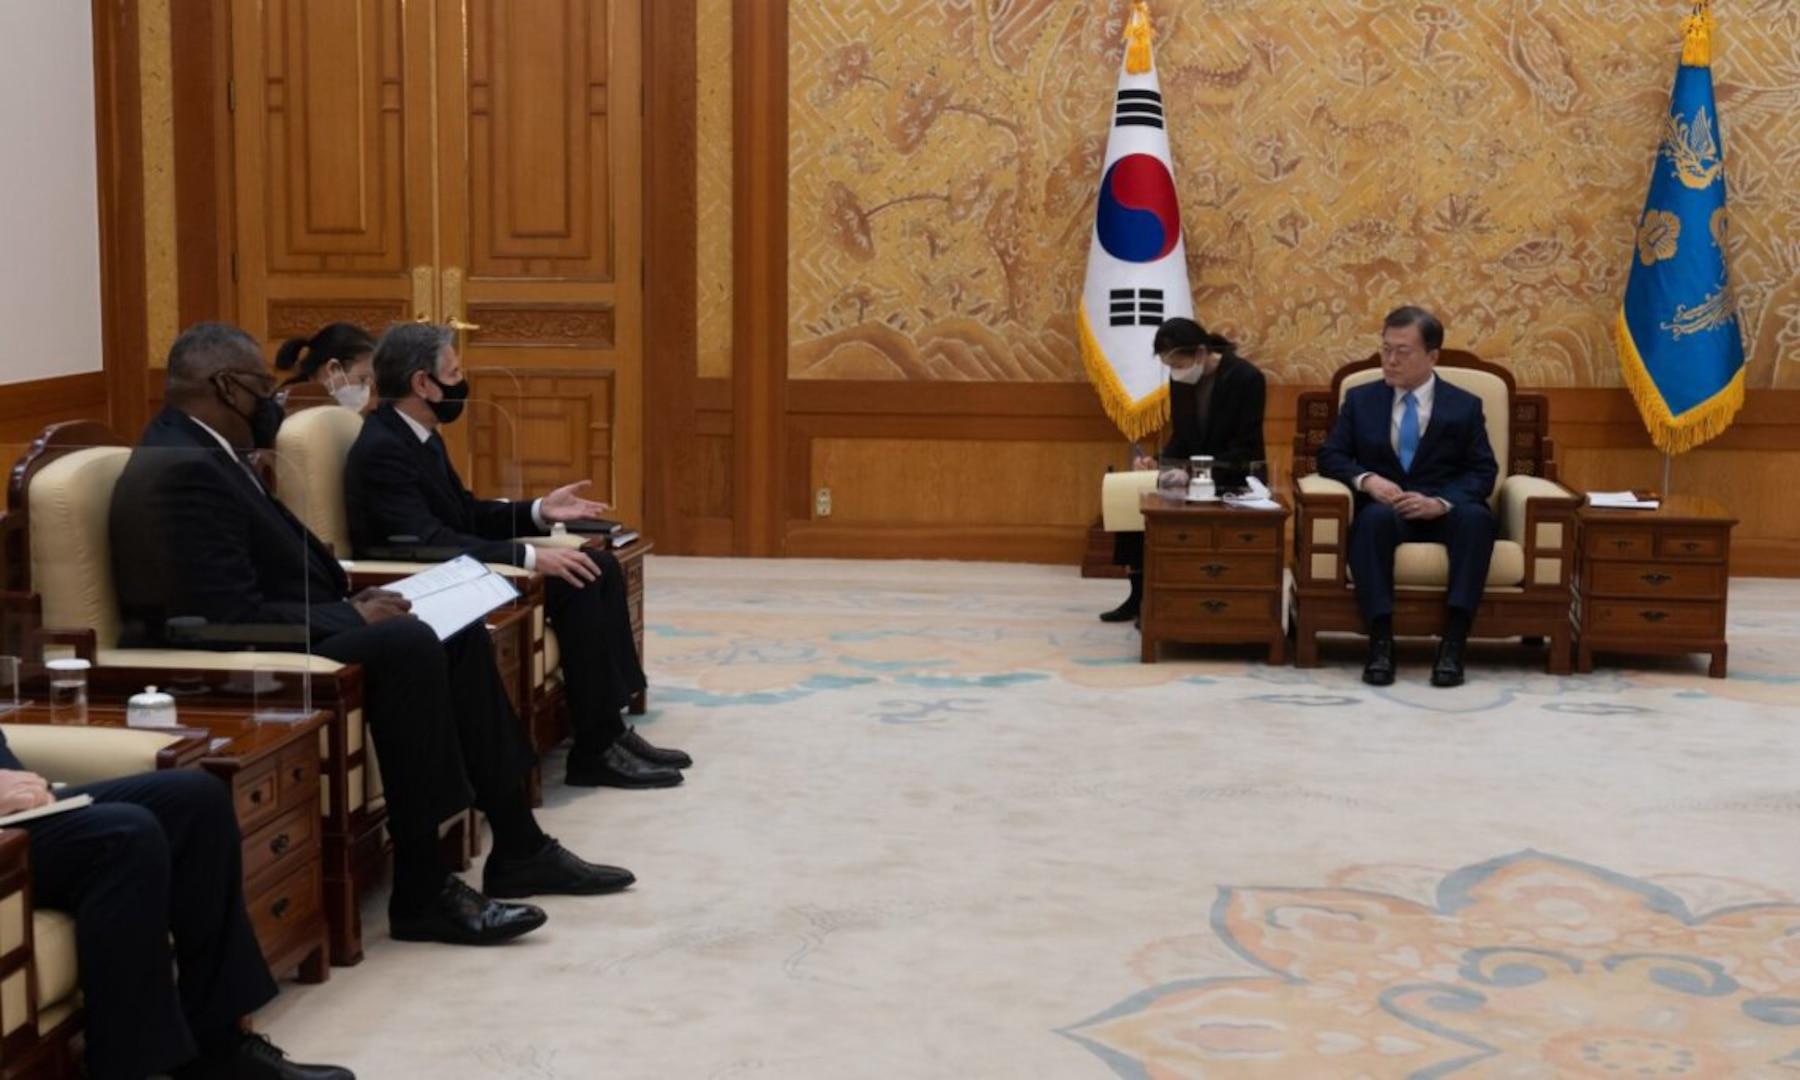 Secretary Blinken and Secretary Austin's Meeting with Republic of Korea President Moon